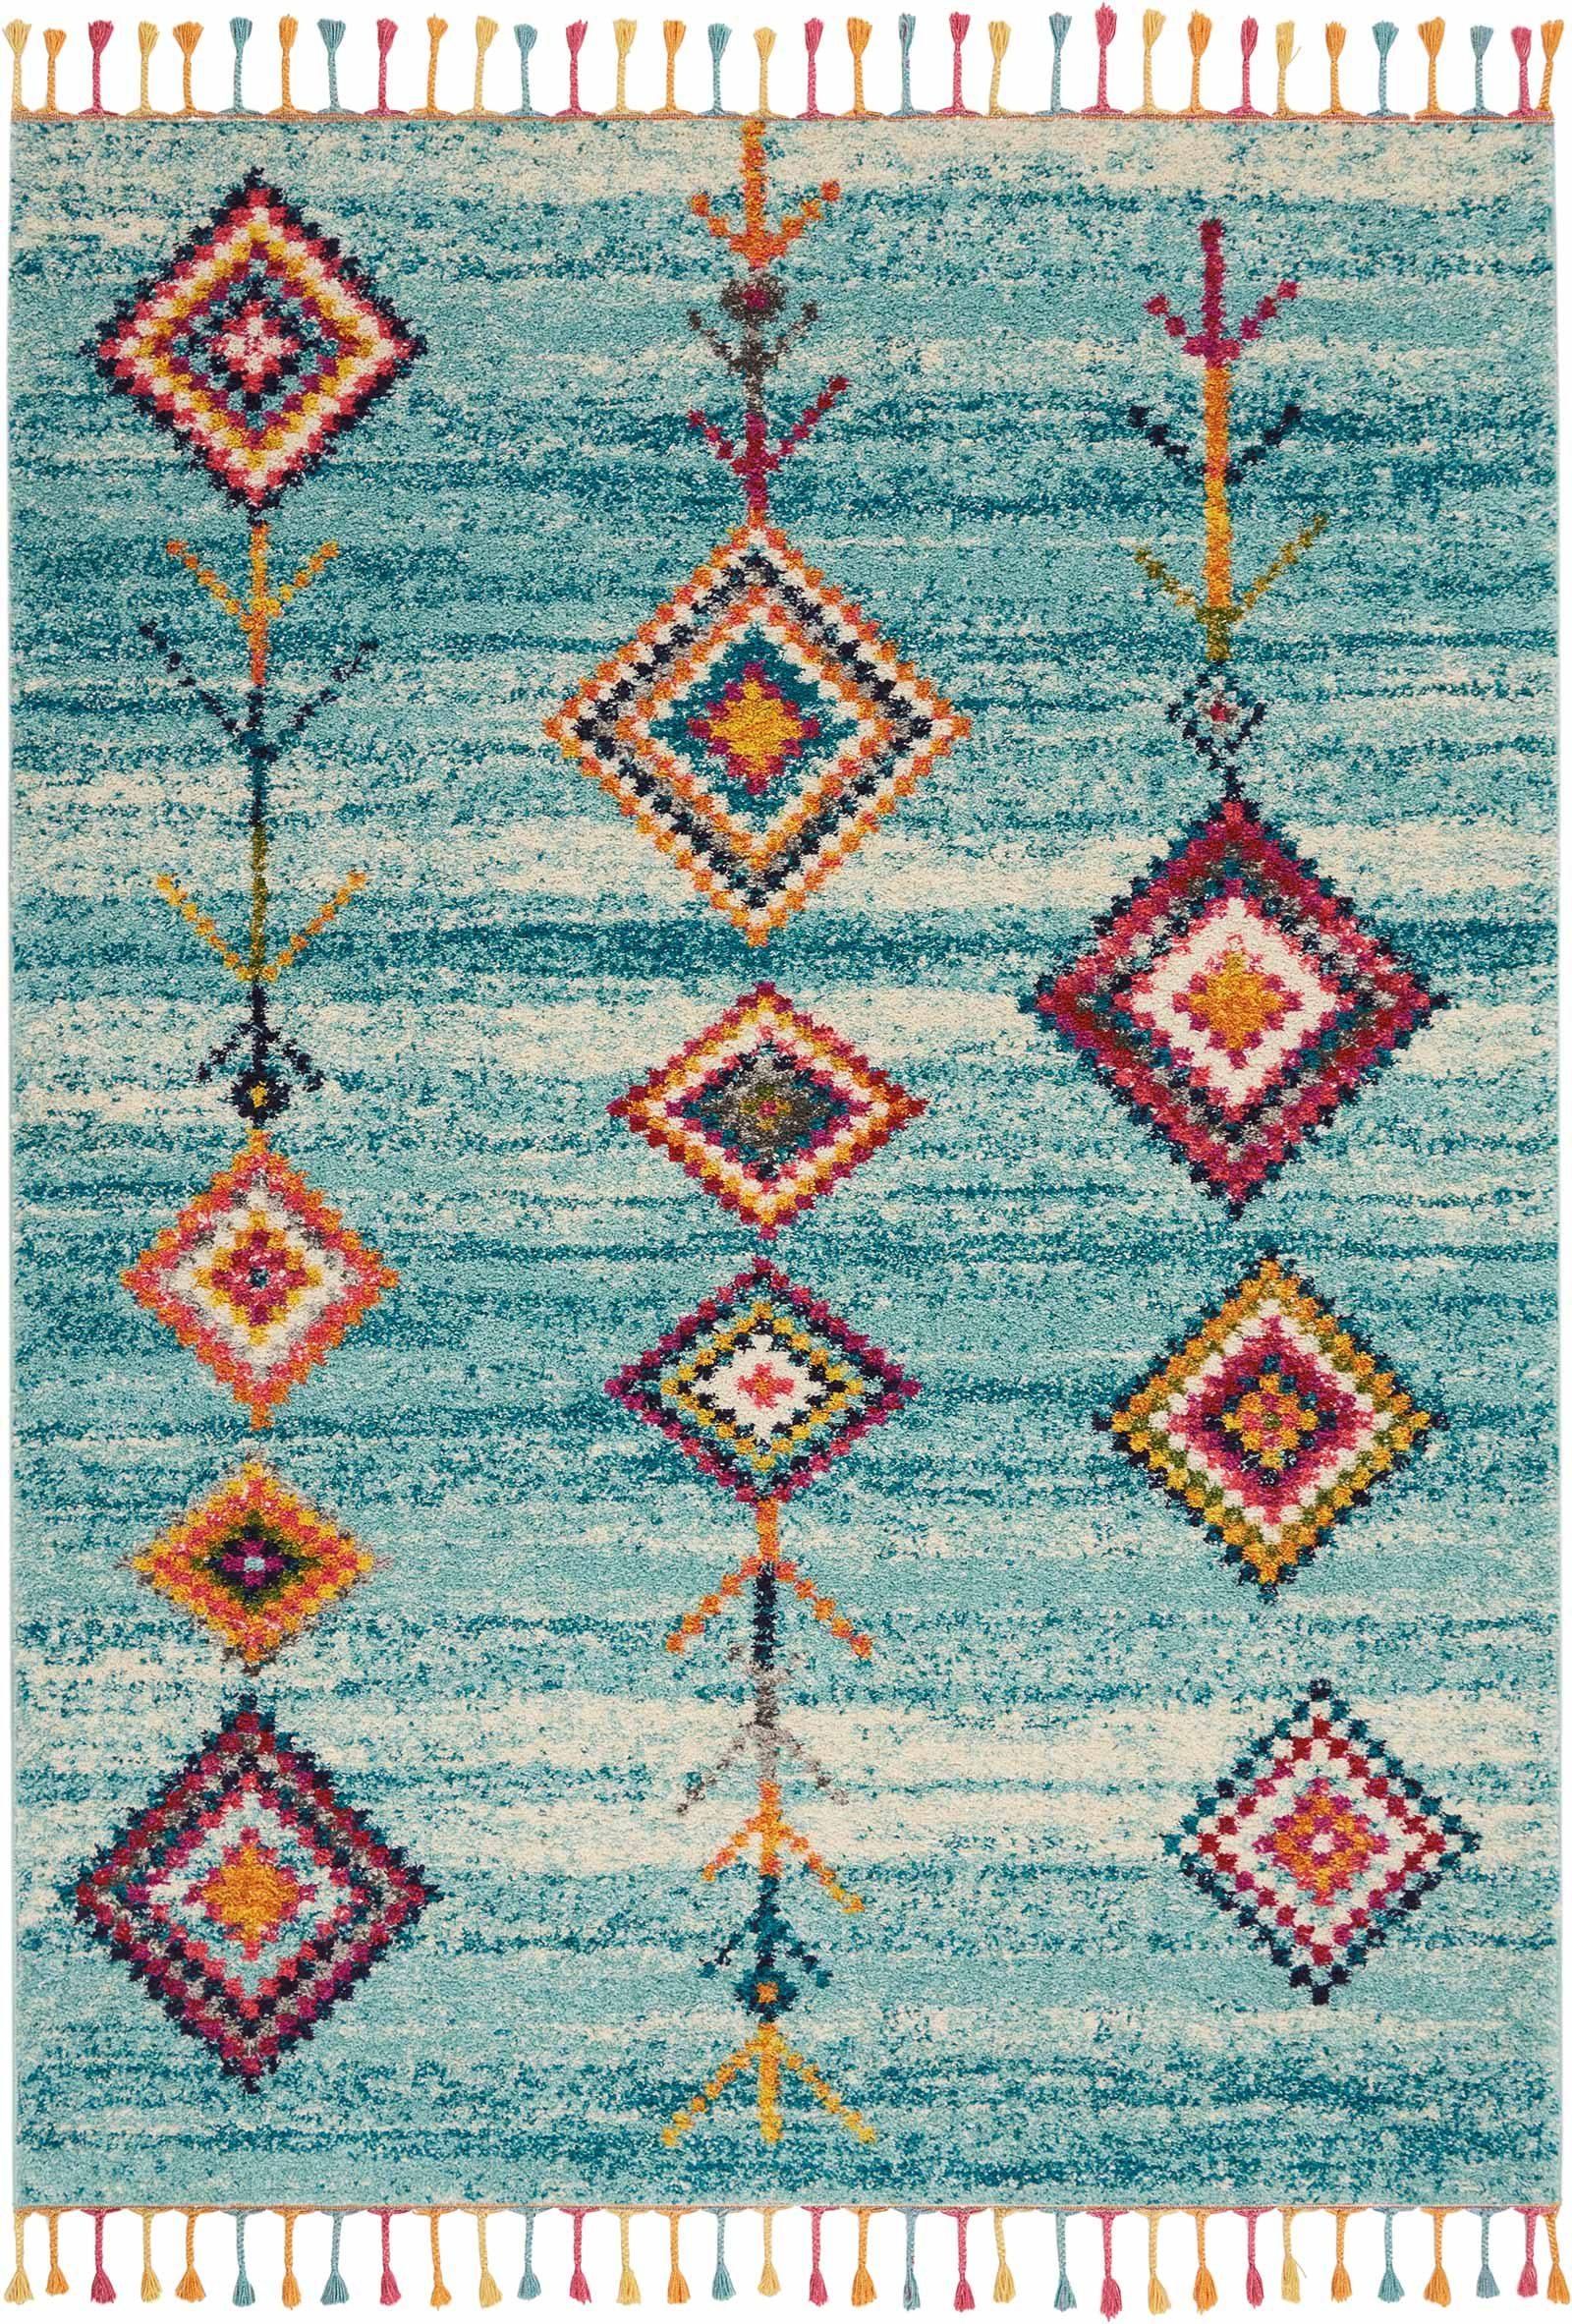 Andessi tapijt Nomad NMD04 AQUA 5x8 099446461490 main